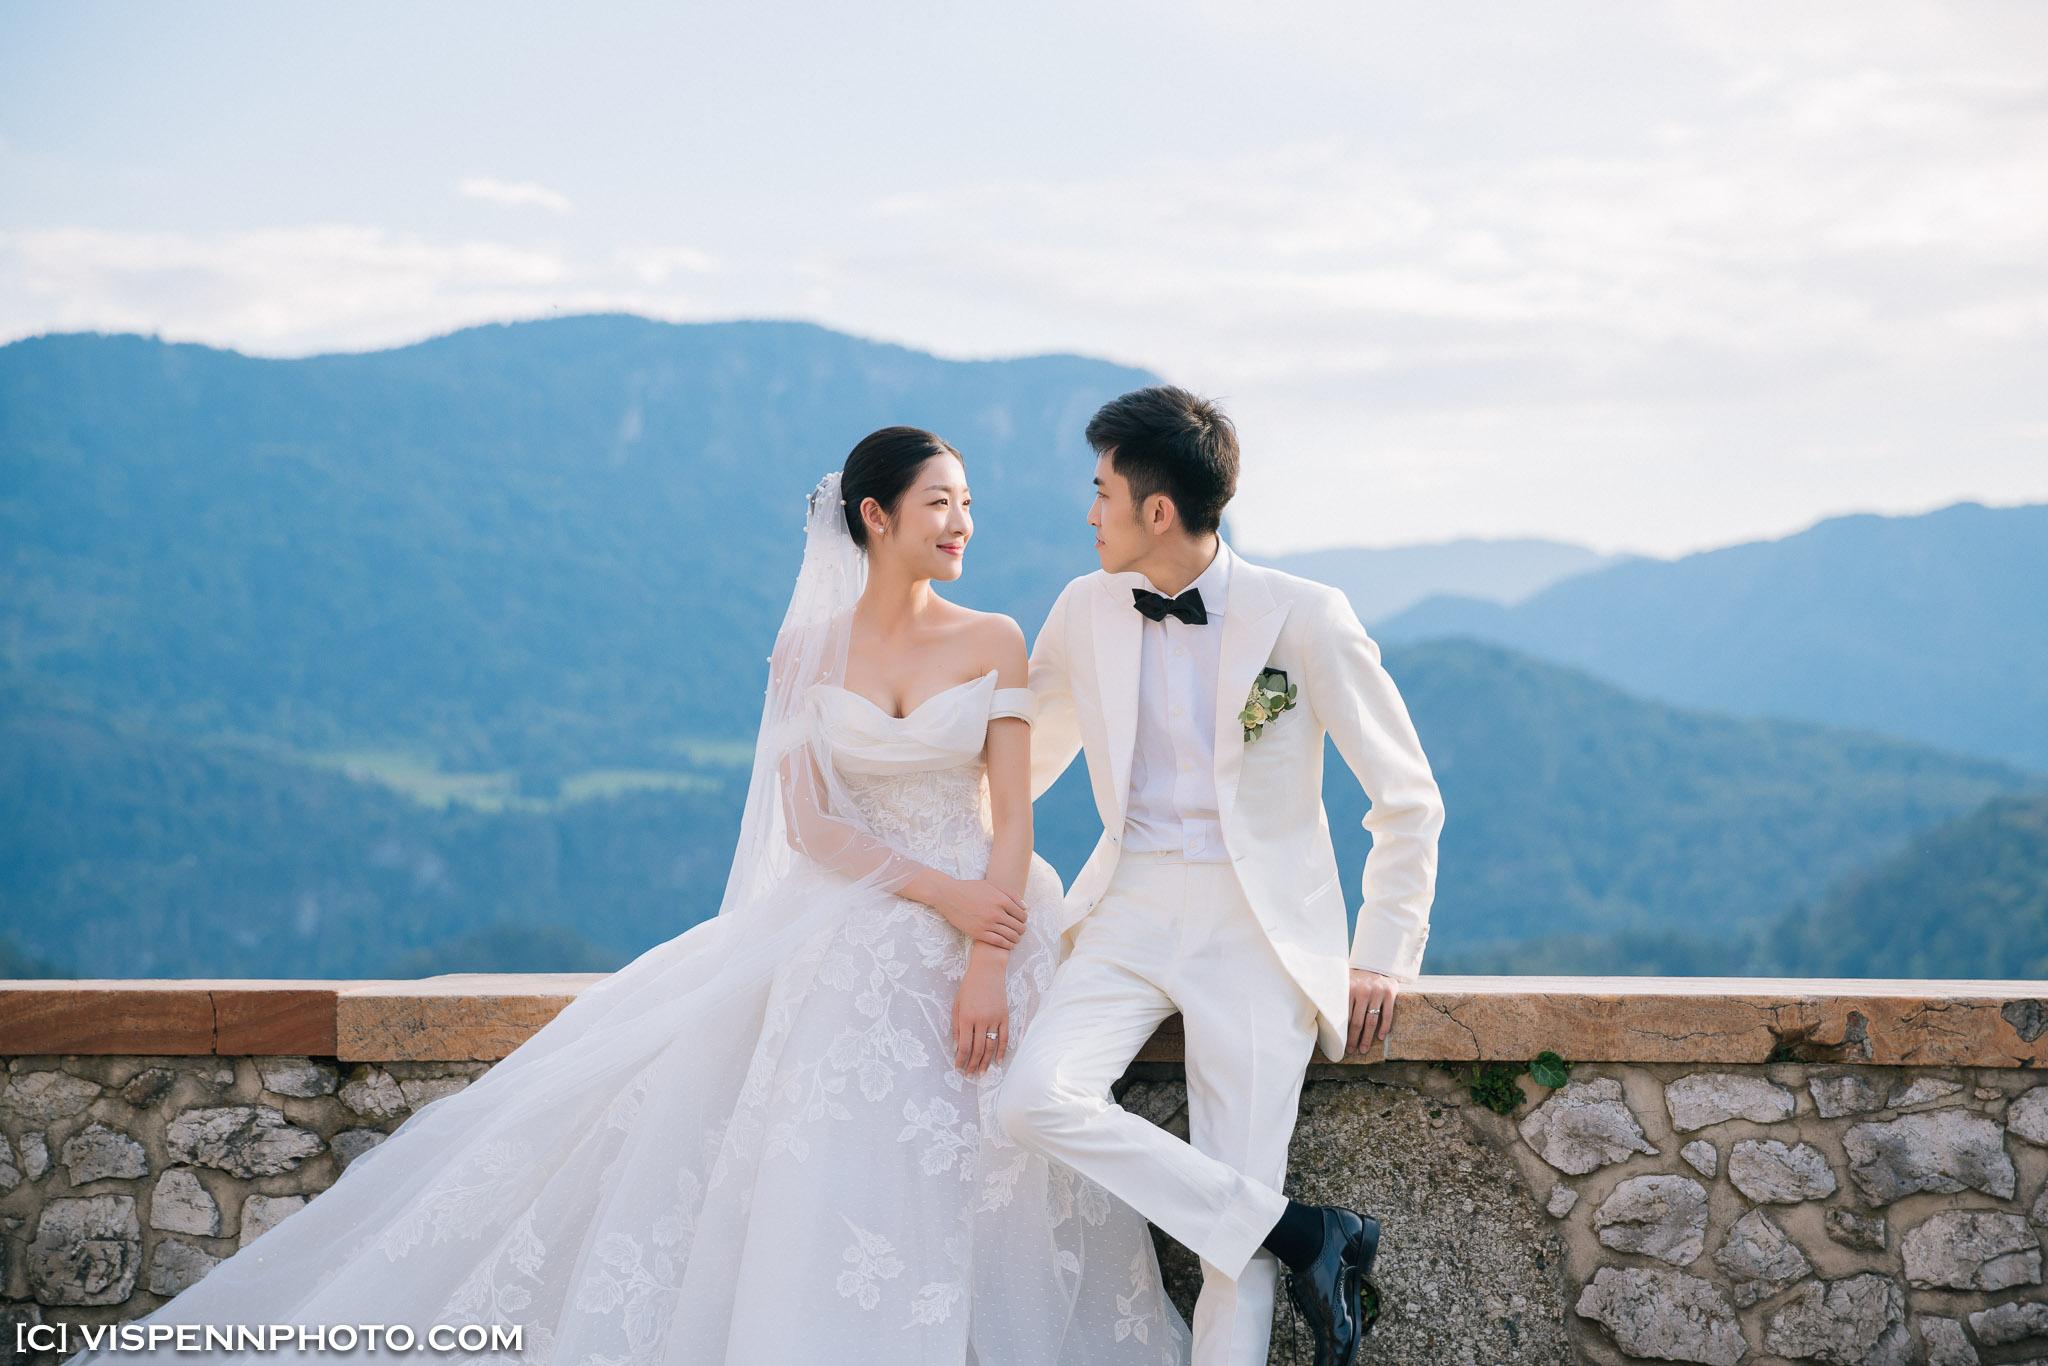 PRE WEDDING Photography Melbourne VISPENN 墨尔本 婚纱照 结婚照 婚纱摄影 DSC03932